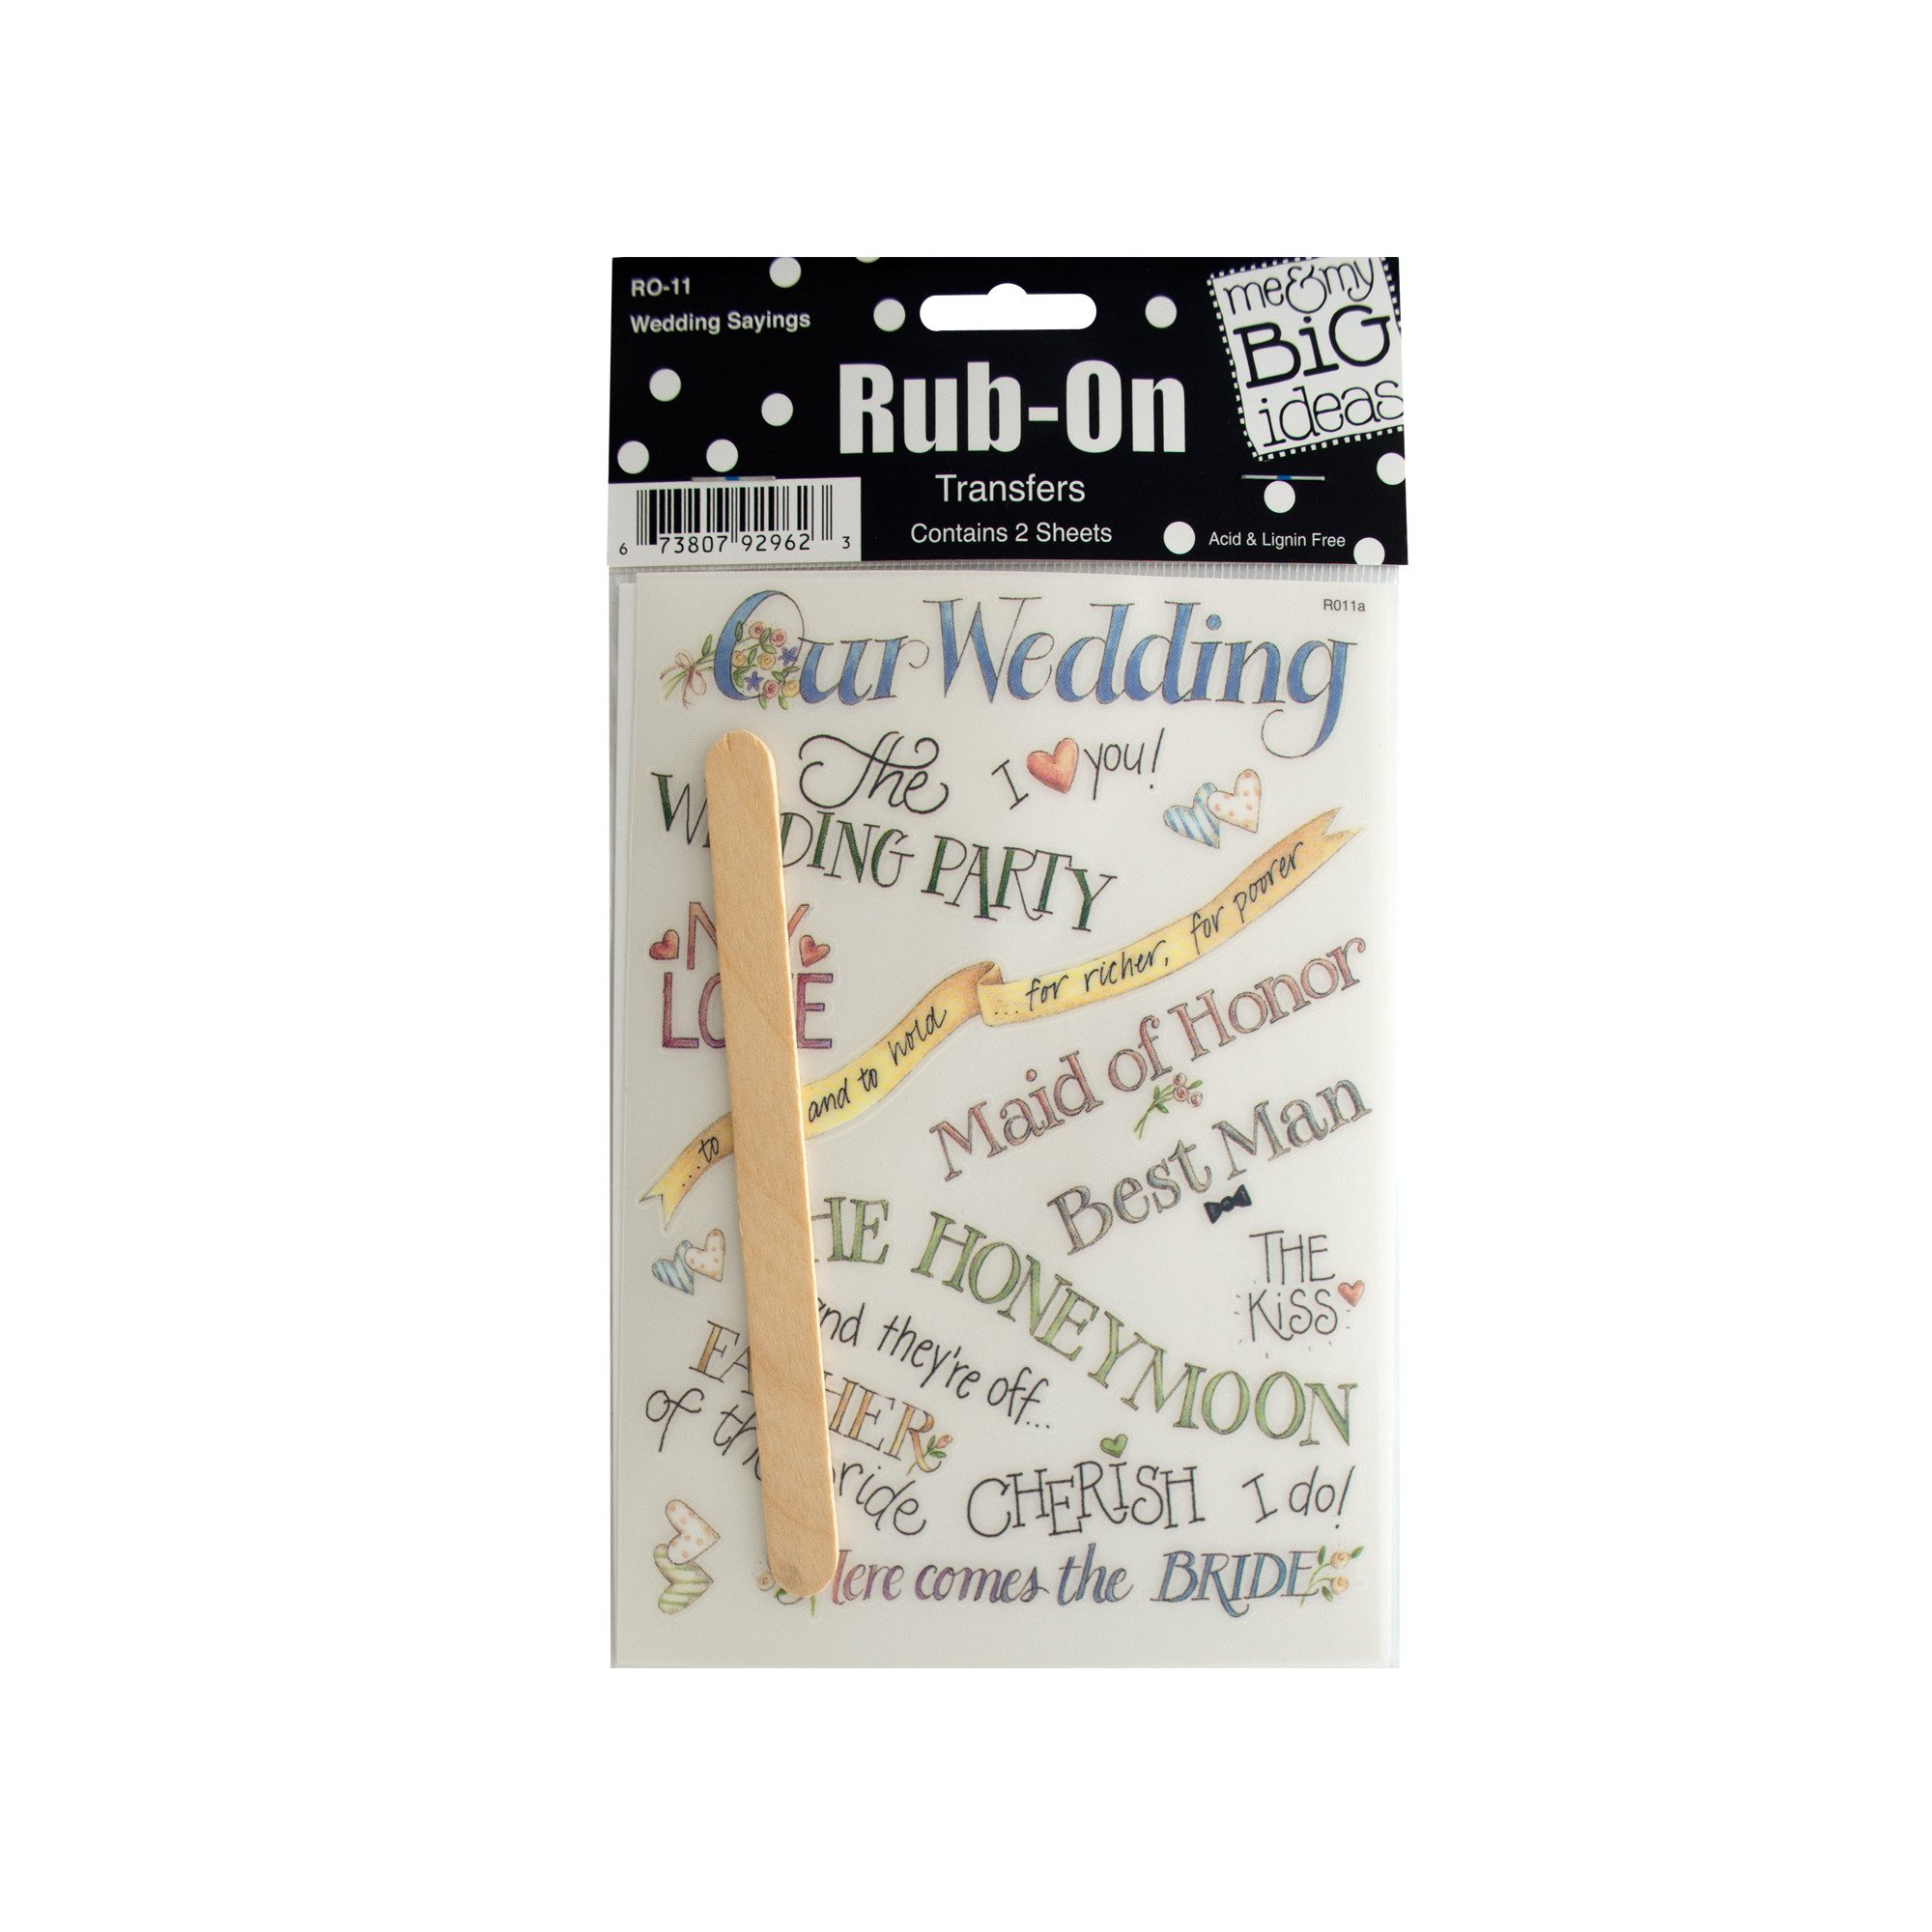 123-Wholesale - Set of 48 Wedding Sayings Rub-On Transfers - Scrapbooking Rub-ons